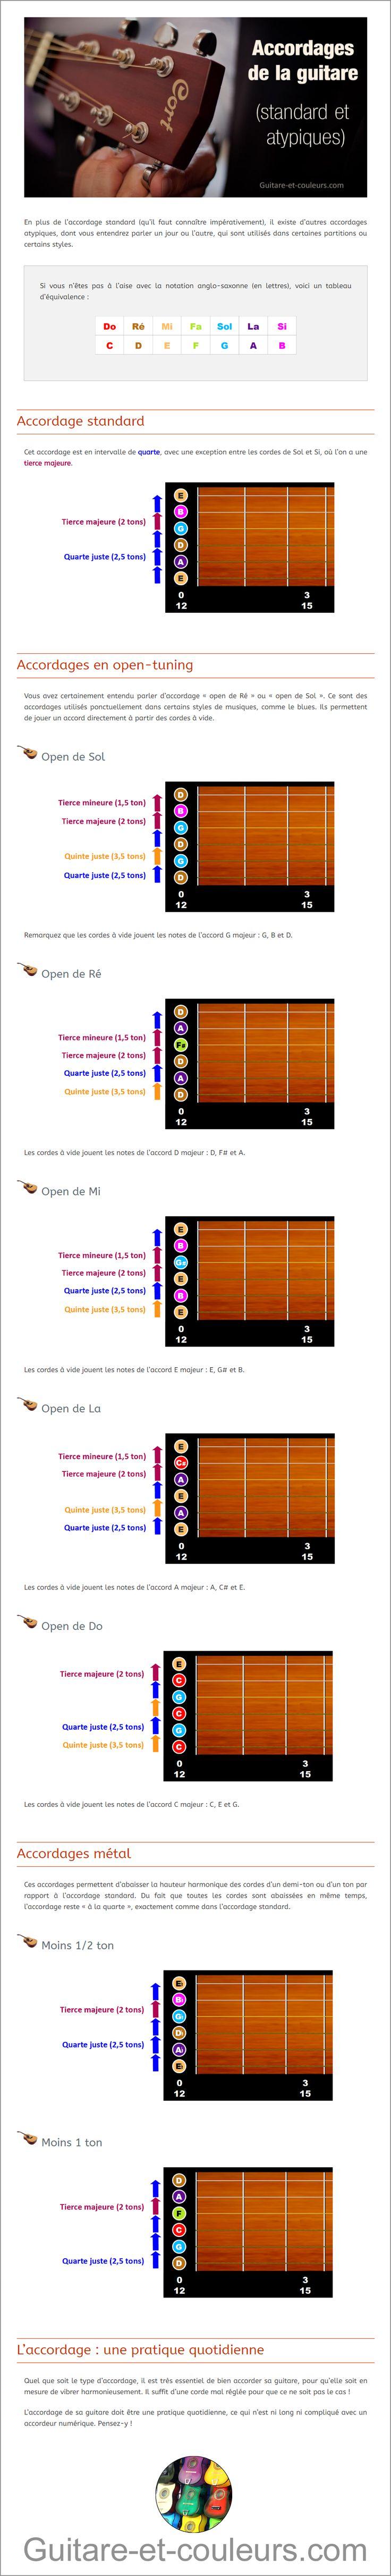 Accordage standard et accordages atypiques de la guitare ...